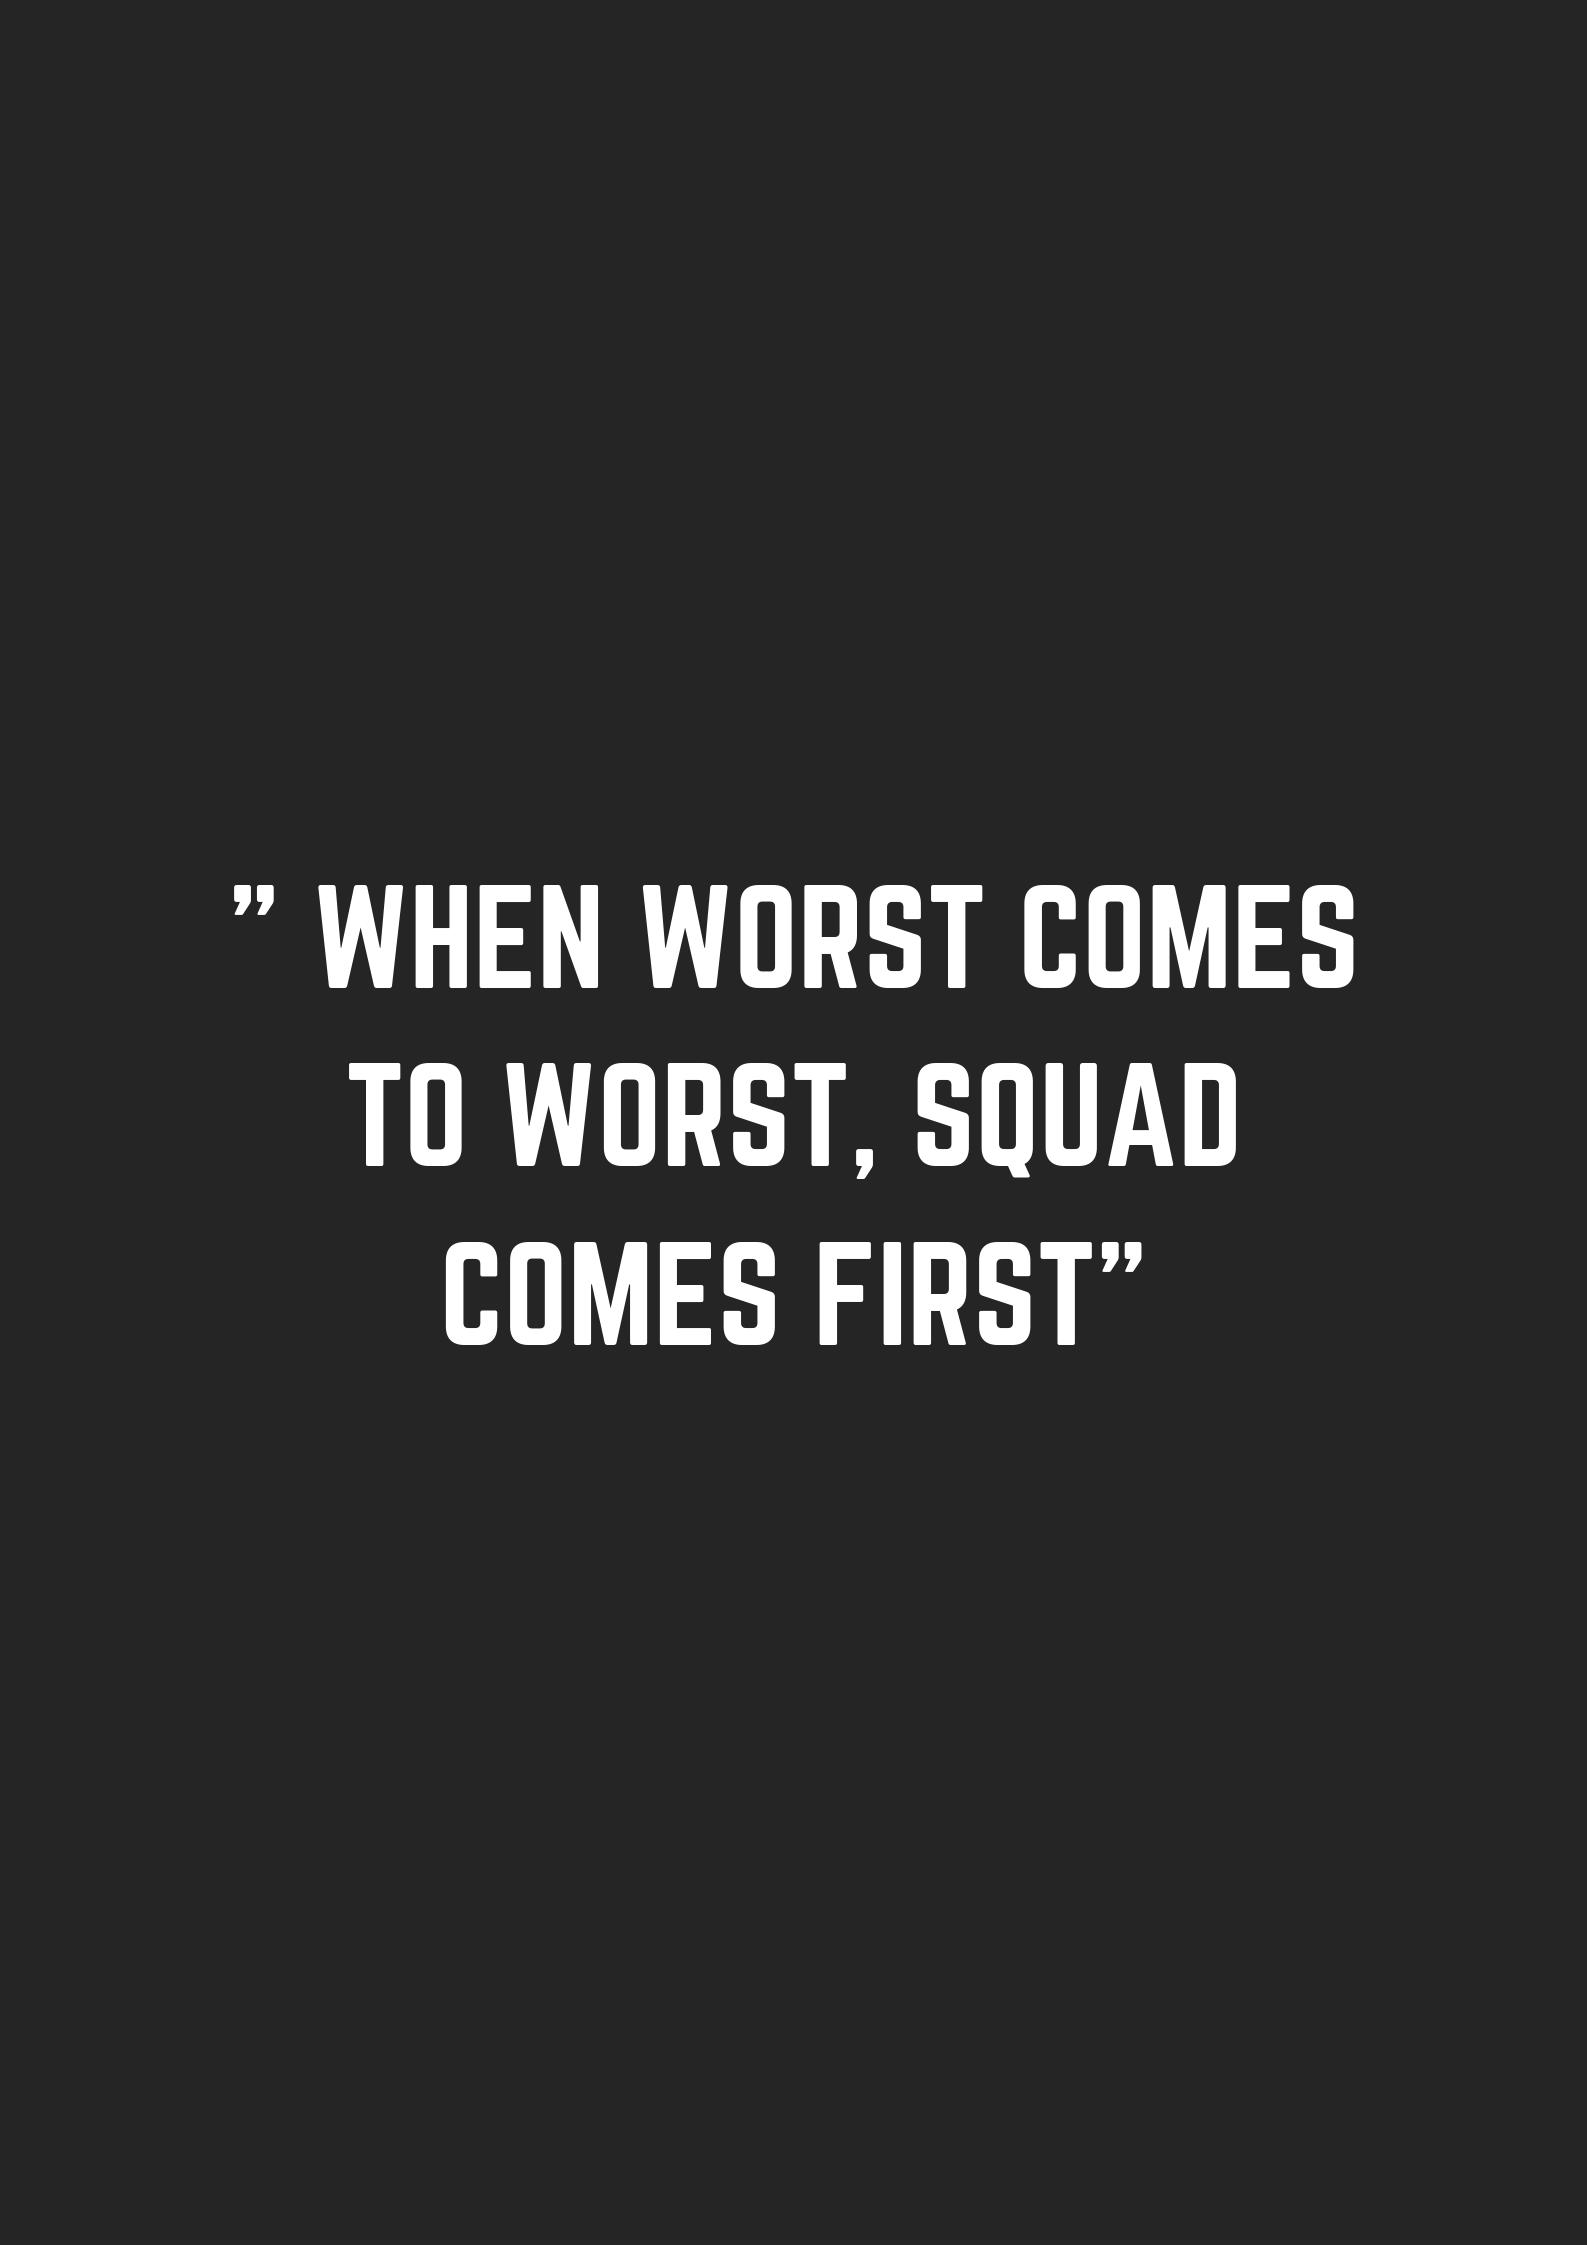 Best Squad Quotes Squad Quote Friendship Quotes Funny Friends Quotes